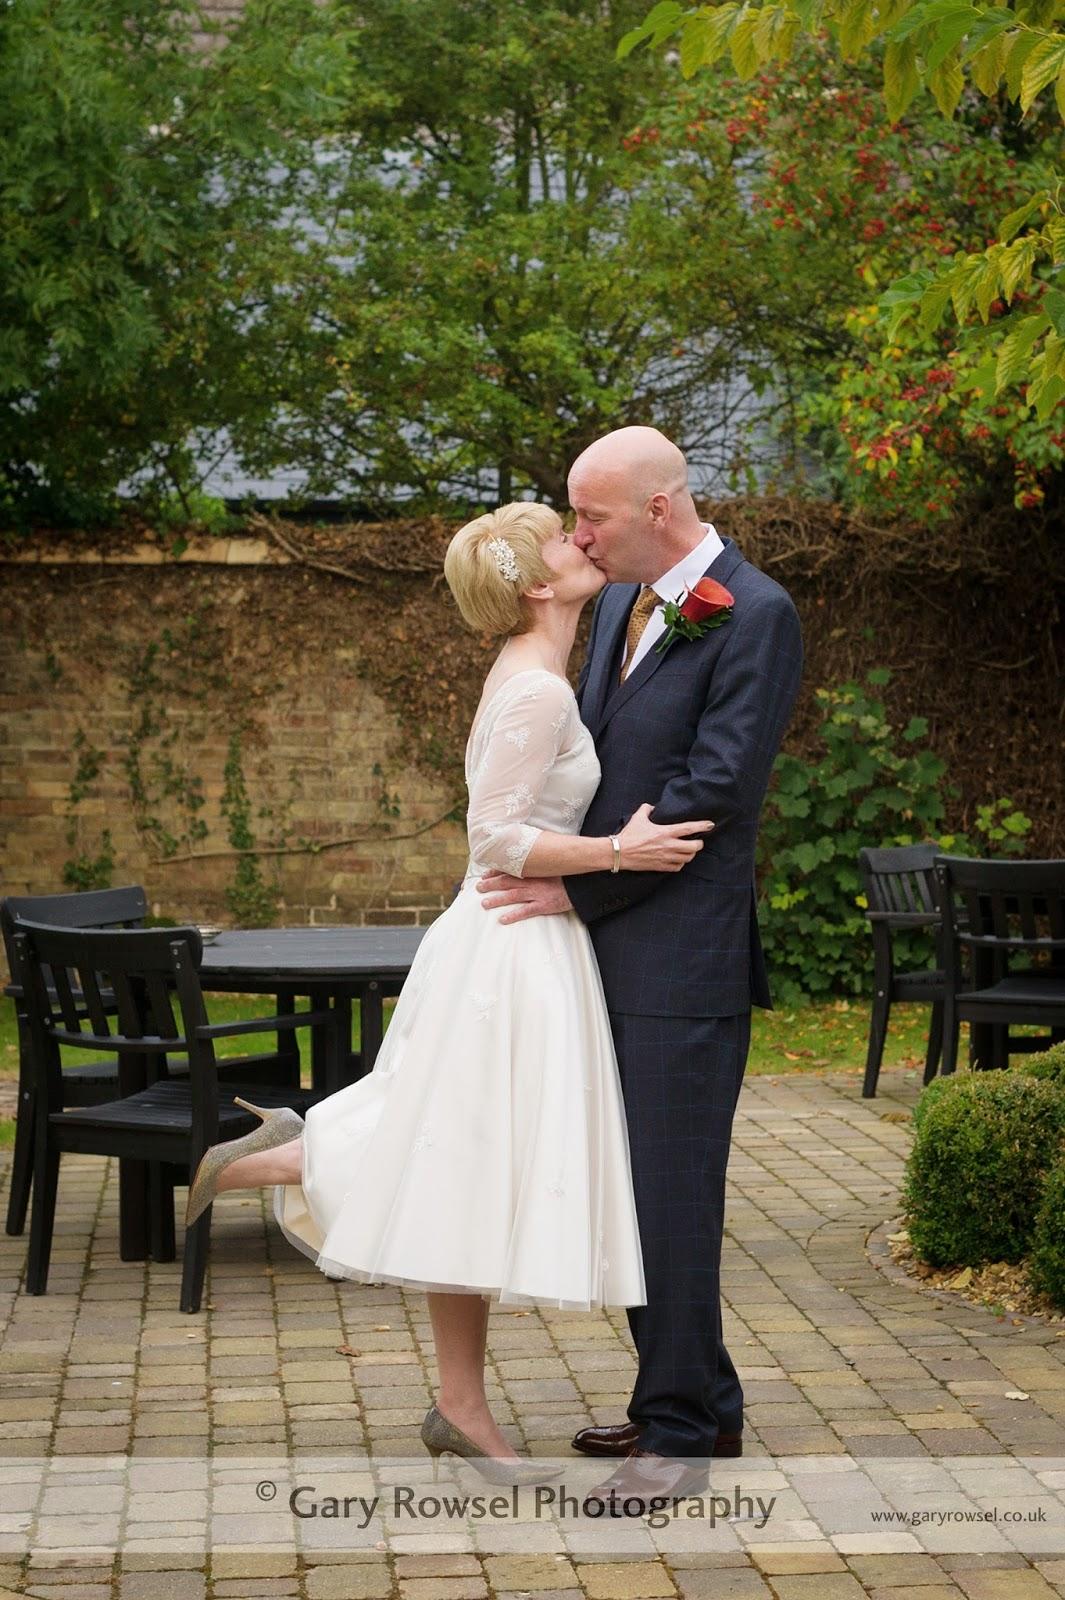 Doubletree hilton cambridge wedding